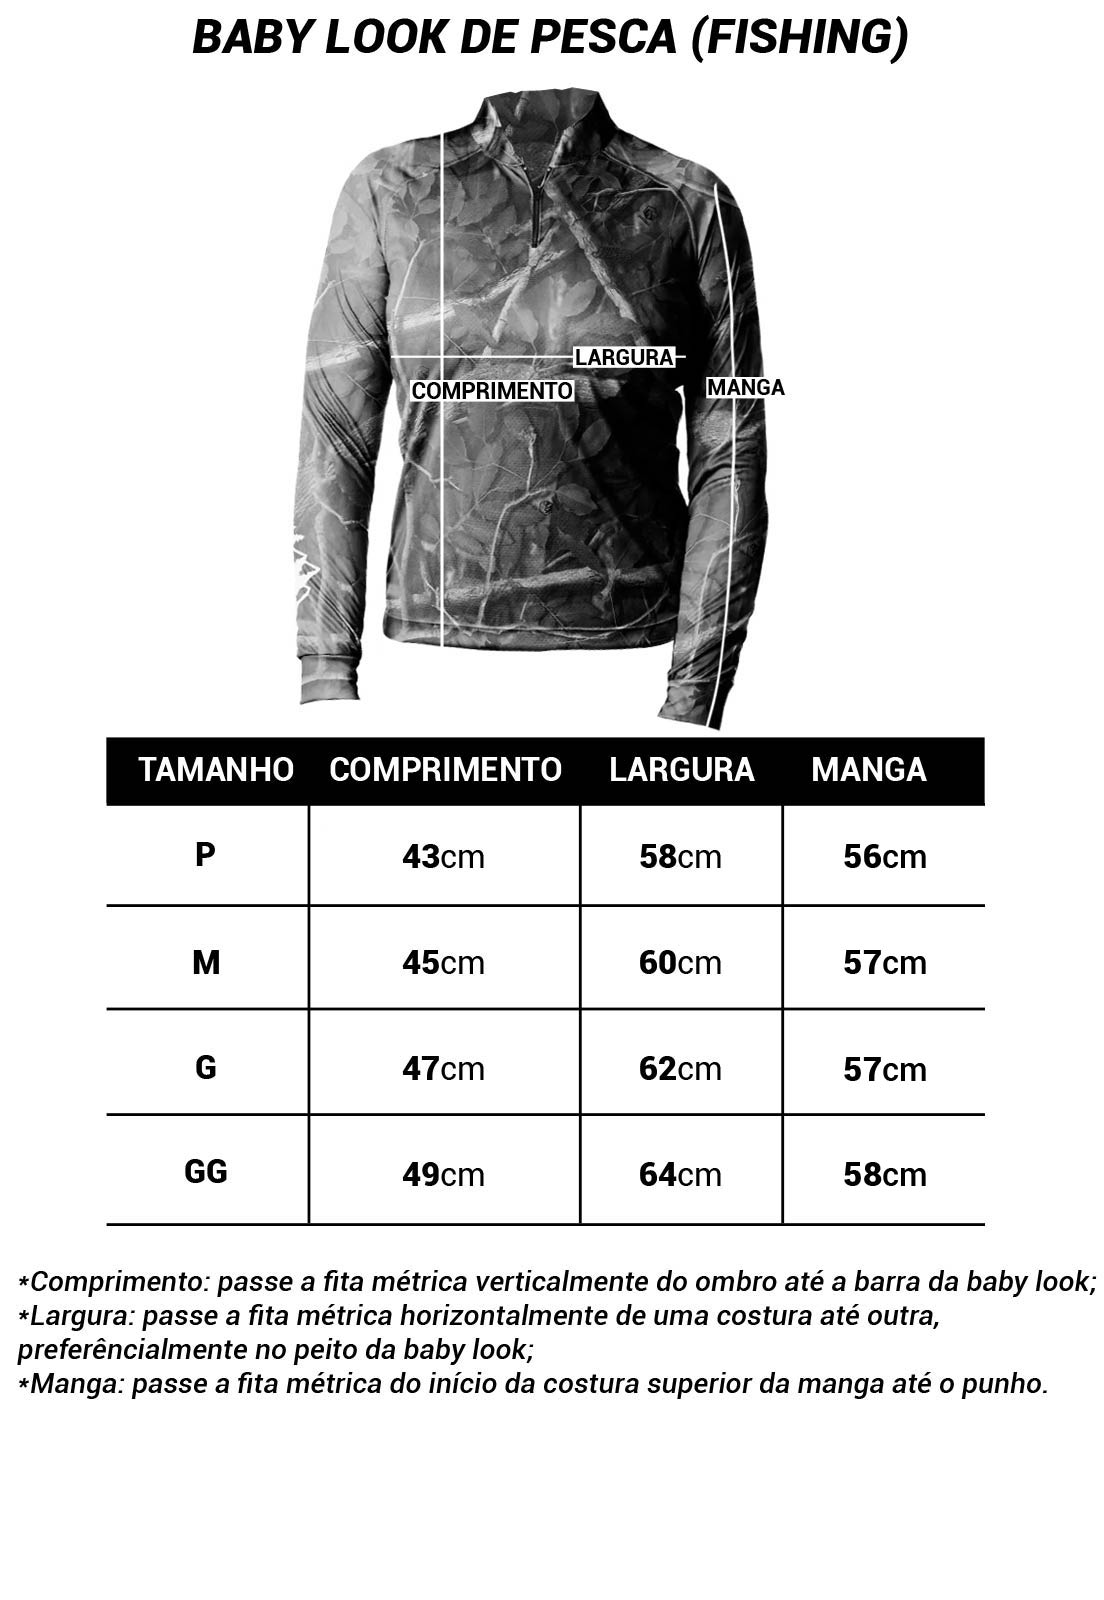 CAMISA DE PESCA FISH TECH PRO 27 FEMININA + BANDANA GRÁTIS  - REAL HUNTER OUTDOORS